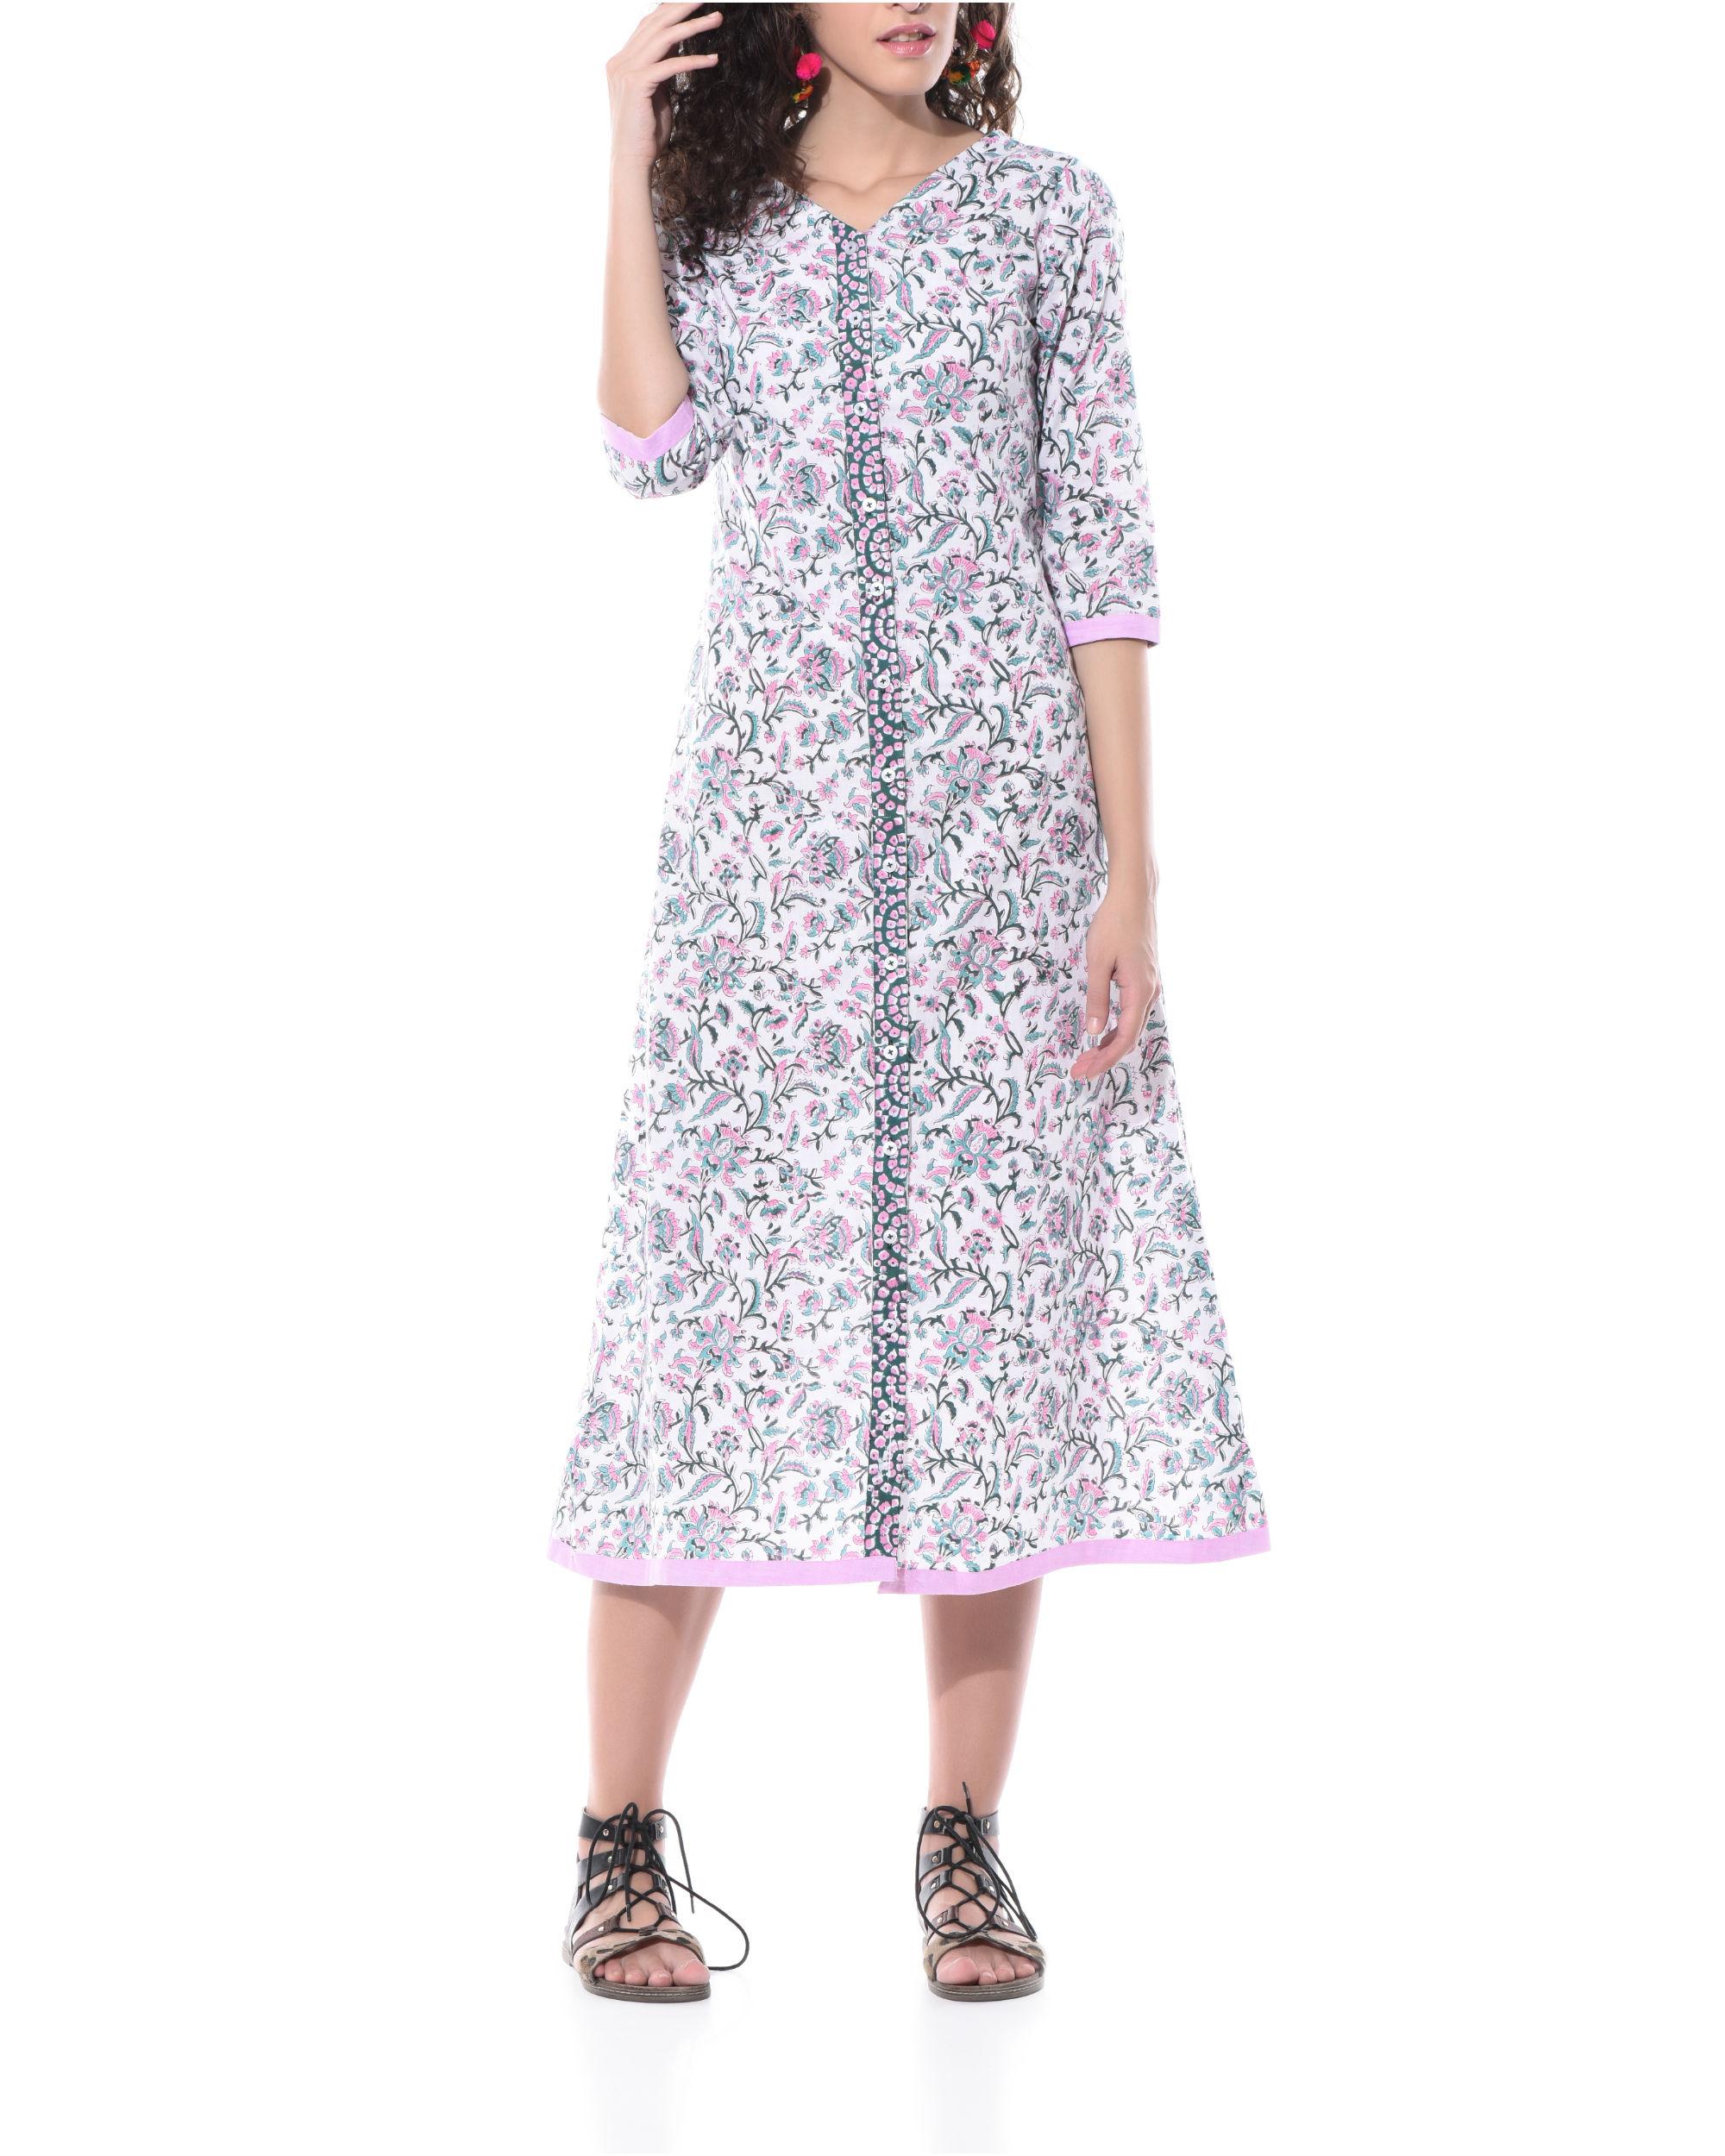 Floral hand printed shirt dress